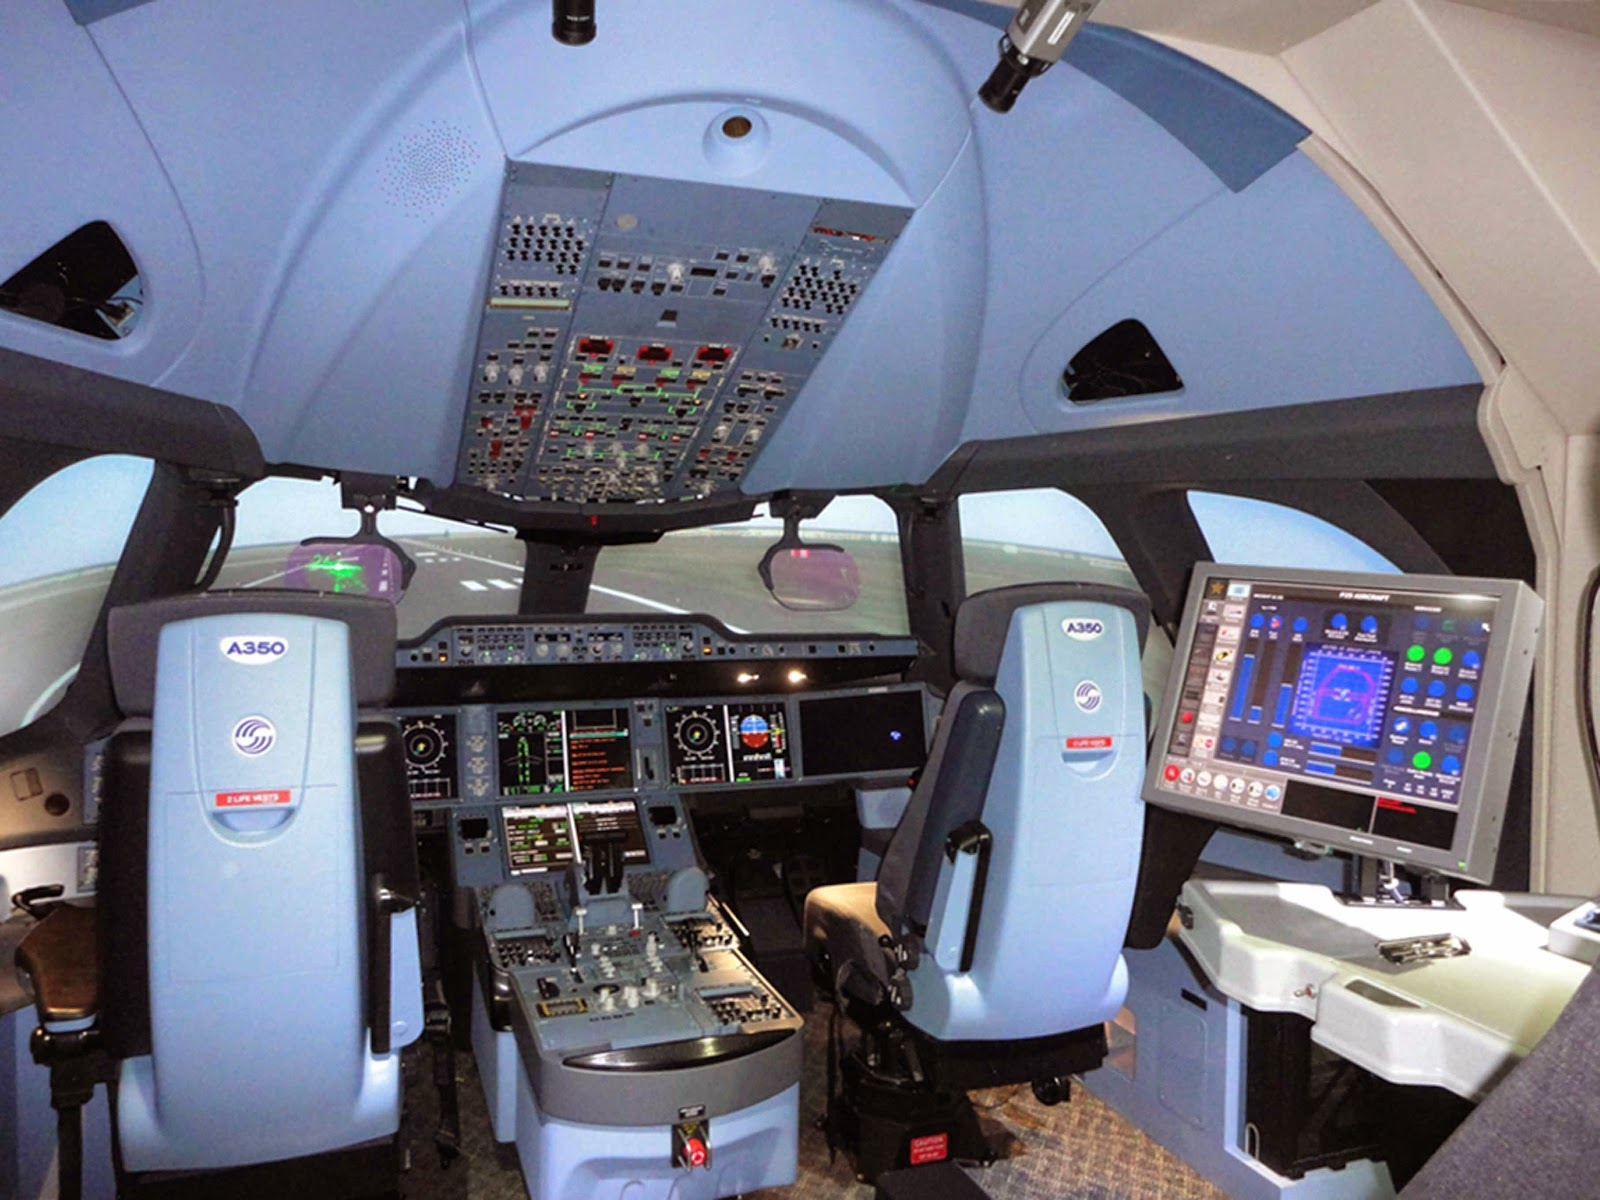 a350 xwb news a350 full flight simulator approval for summer. Black Bedroom Furniture Sets. Home Design Ideas